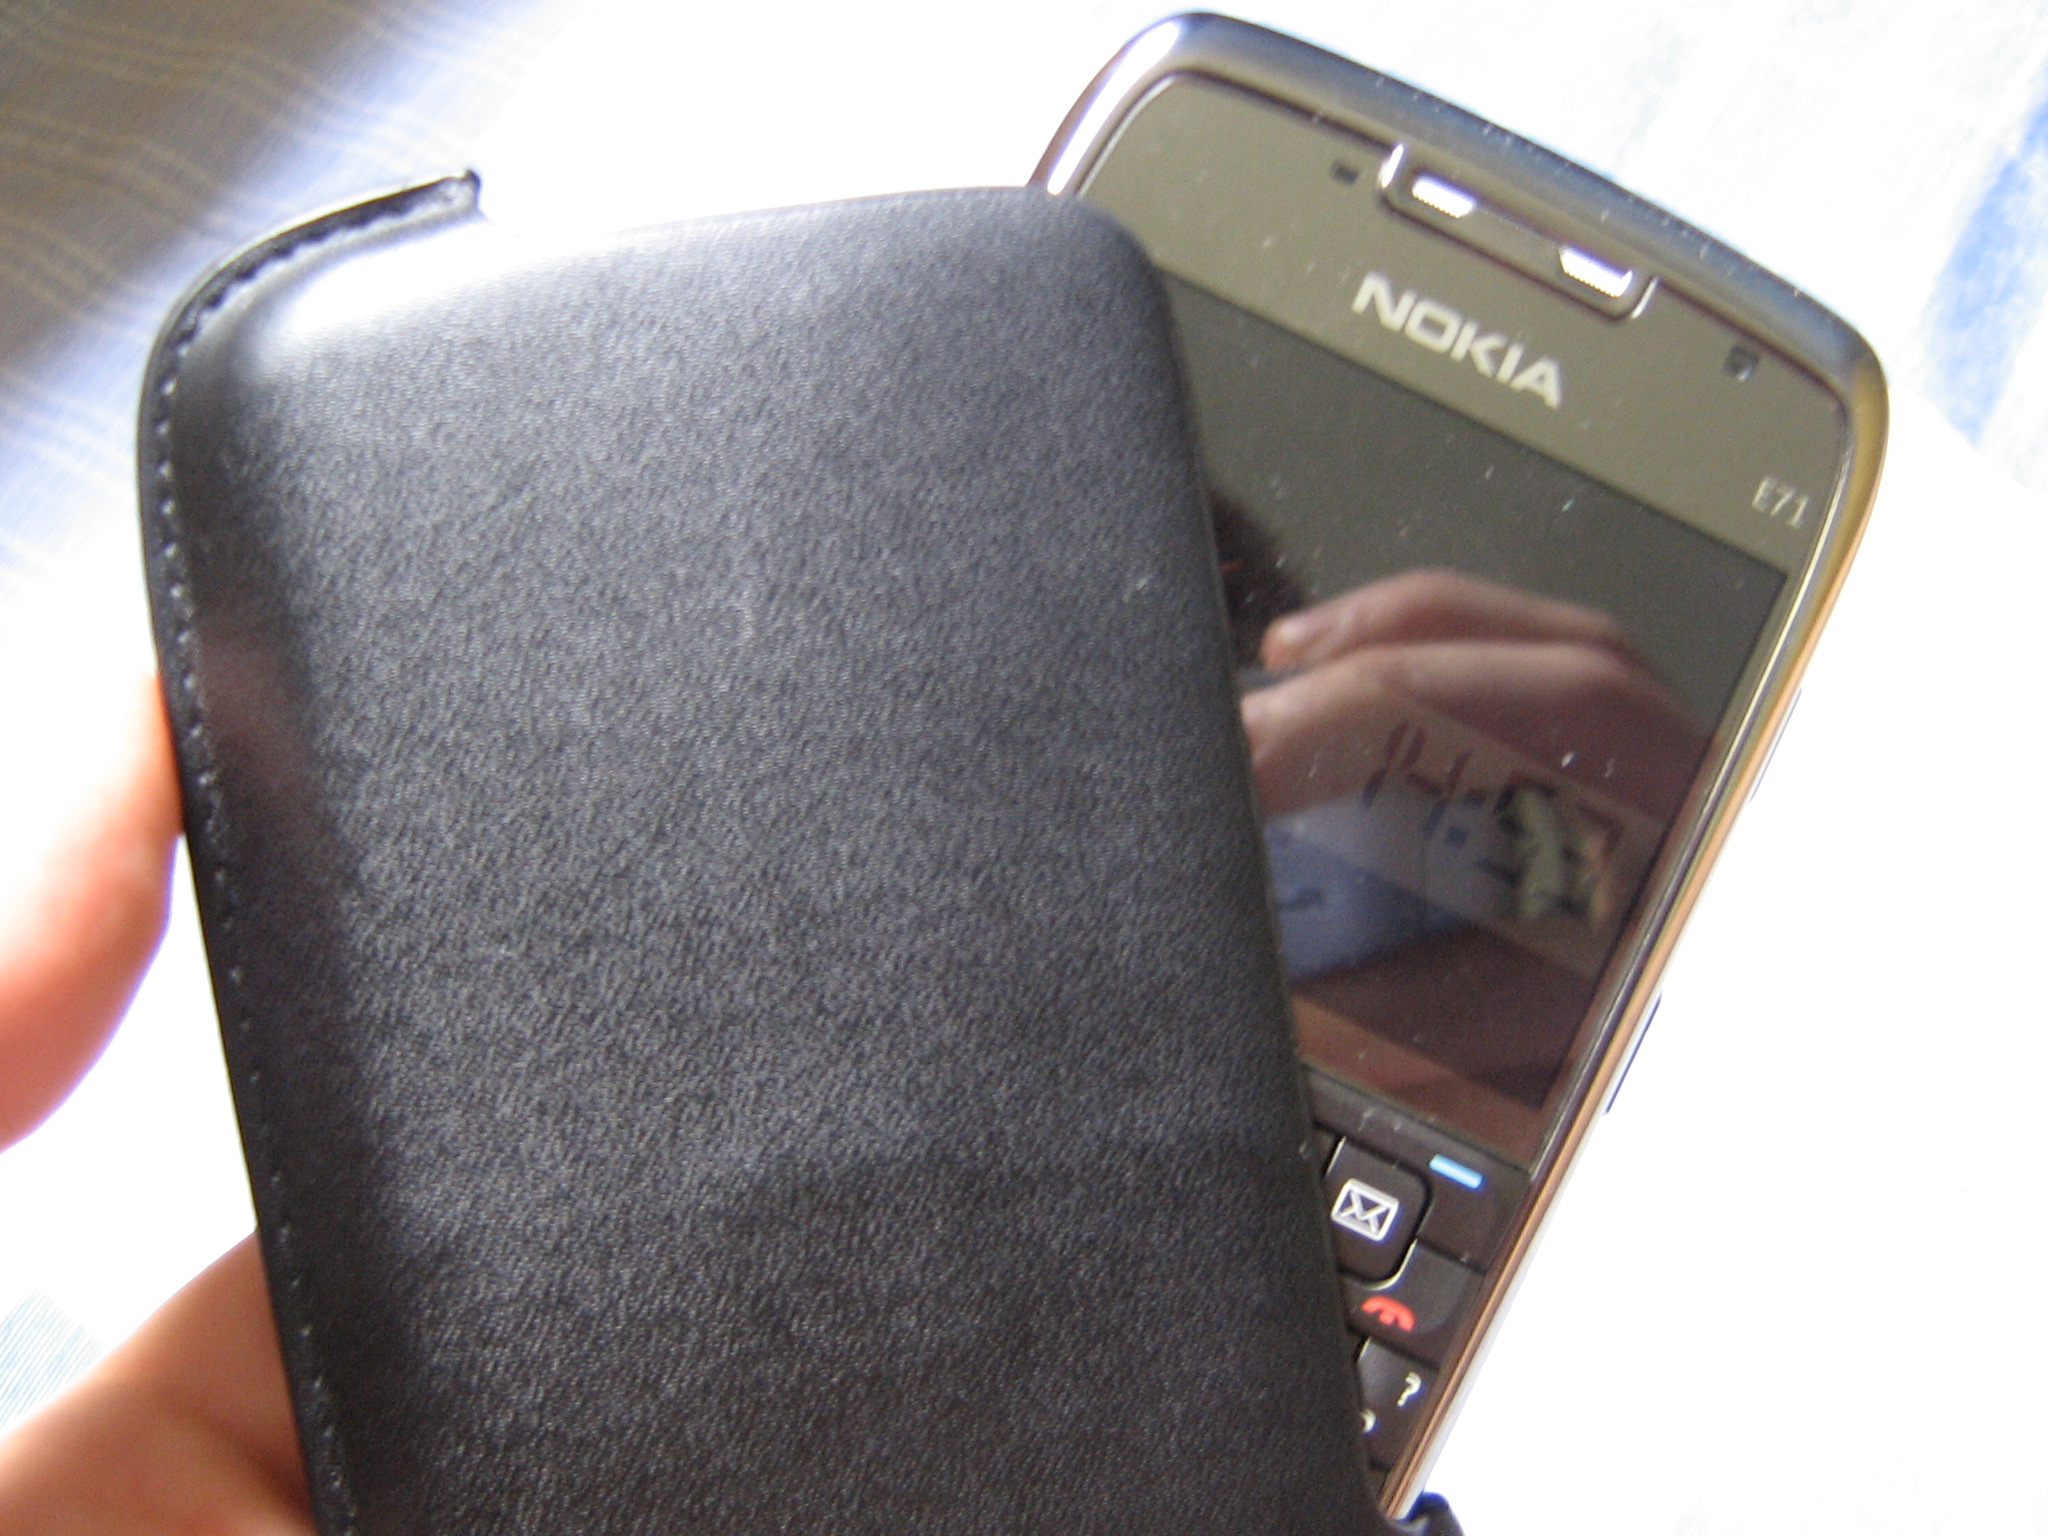 capa preta Nokia E71